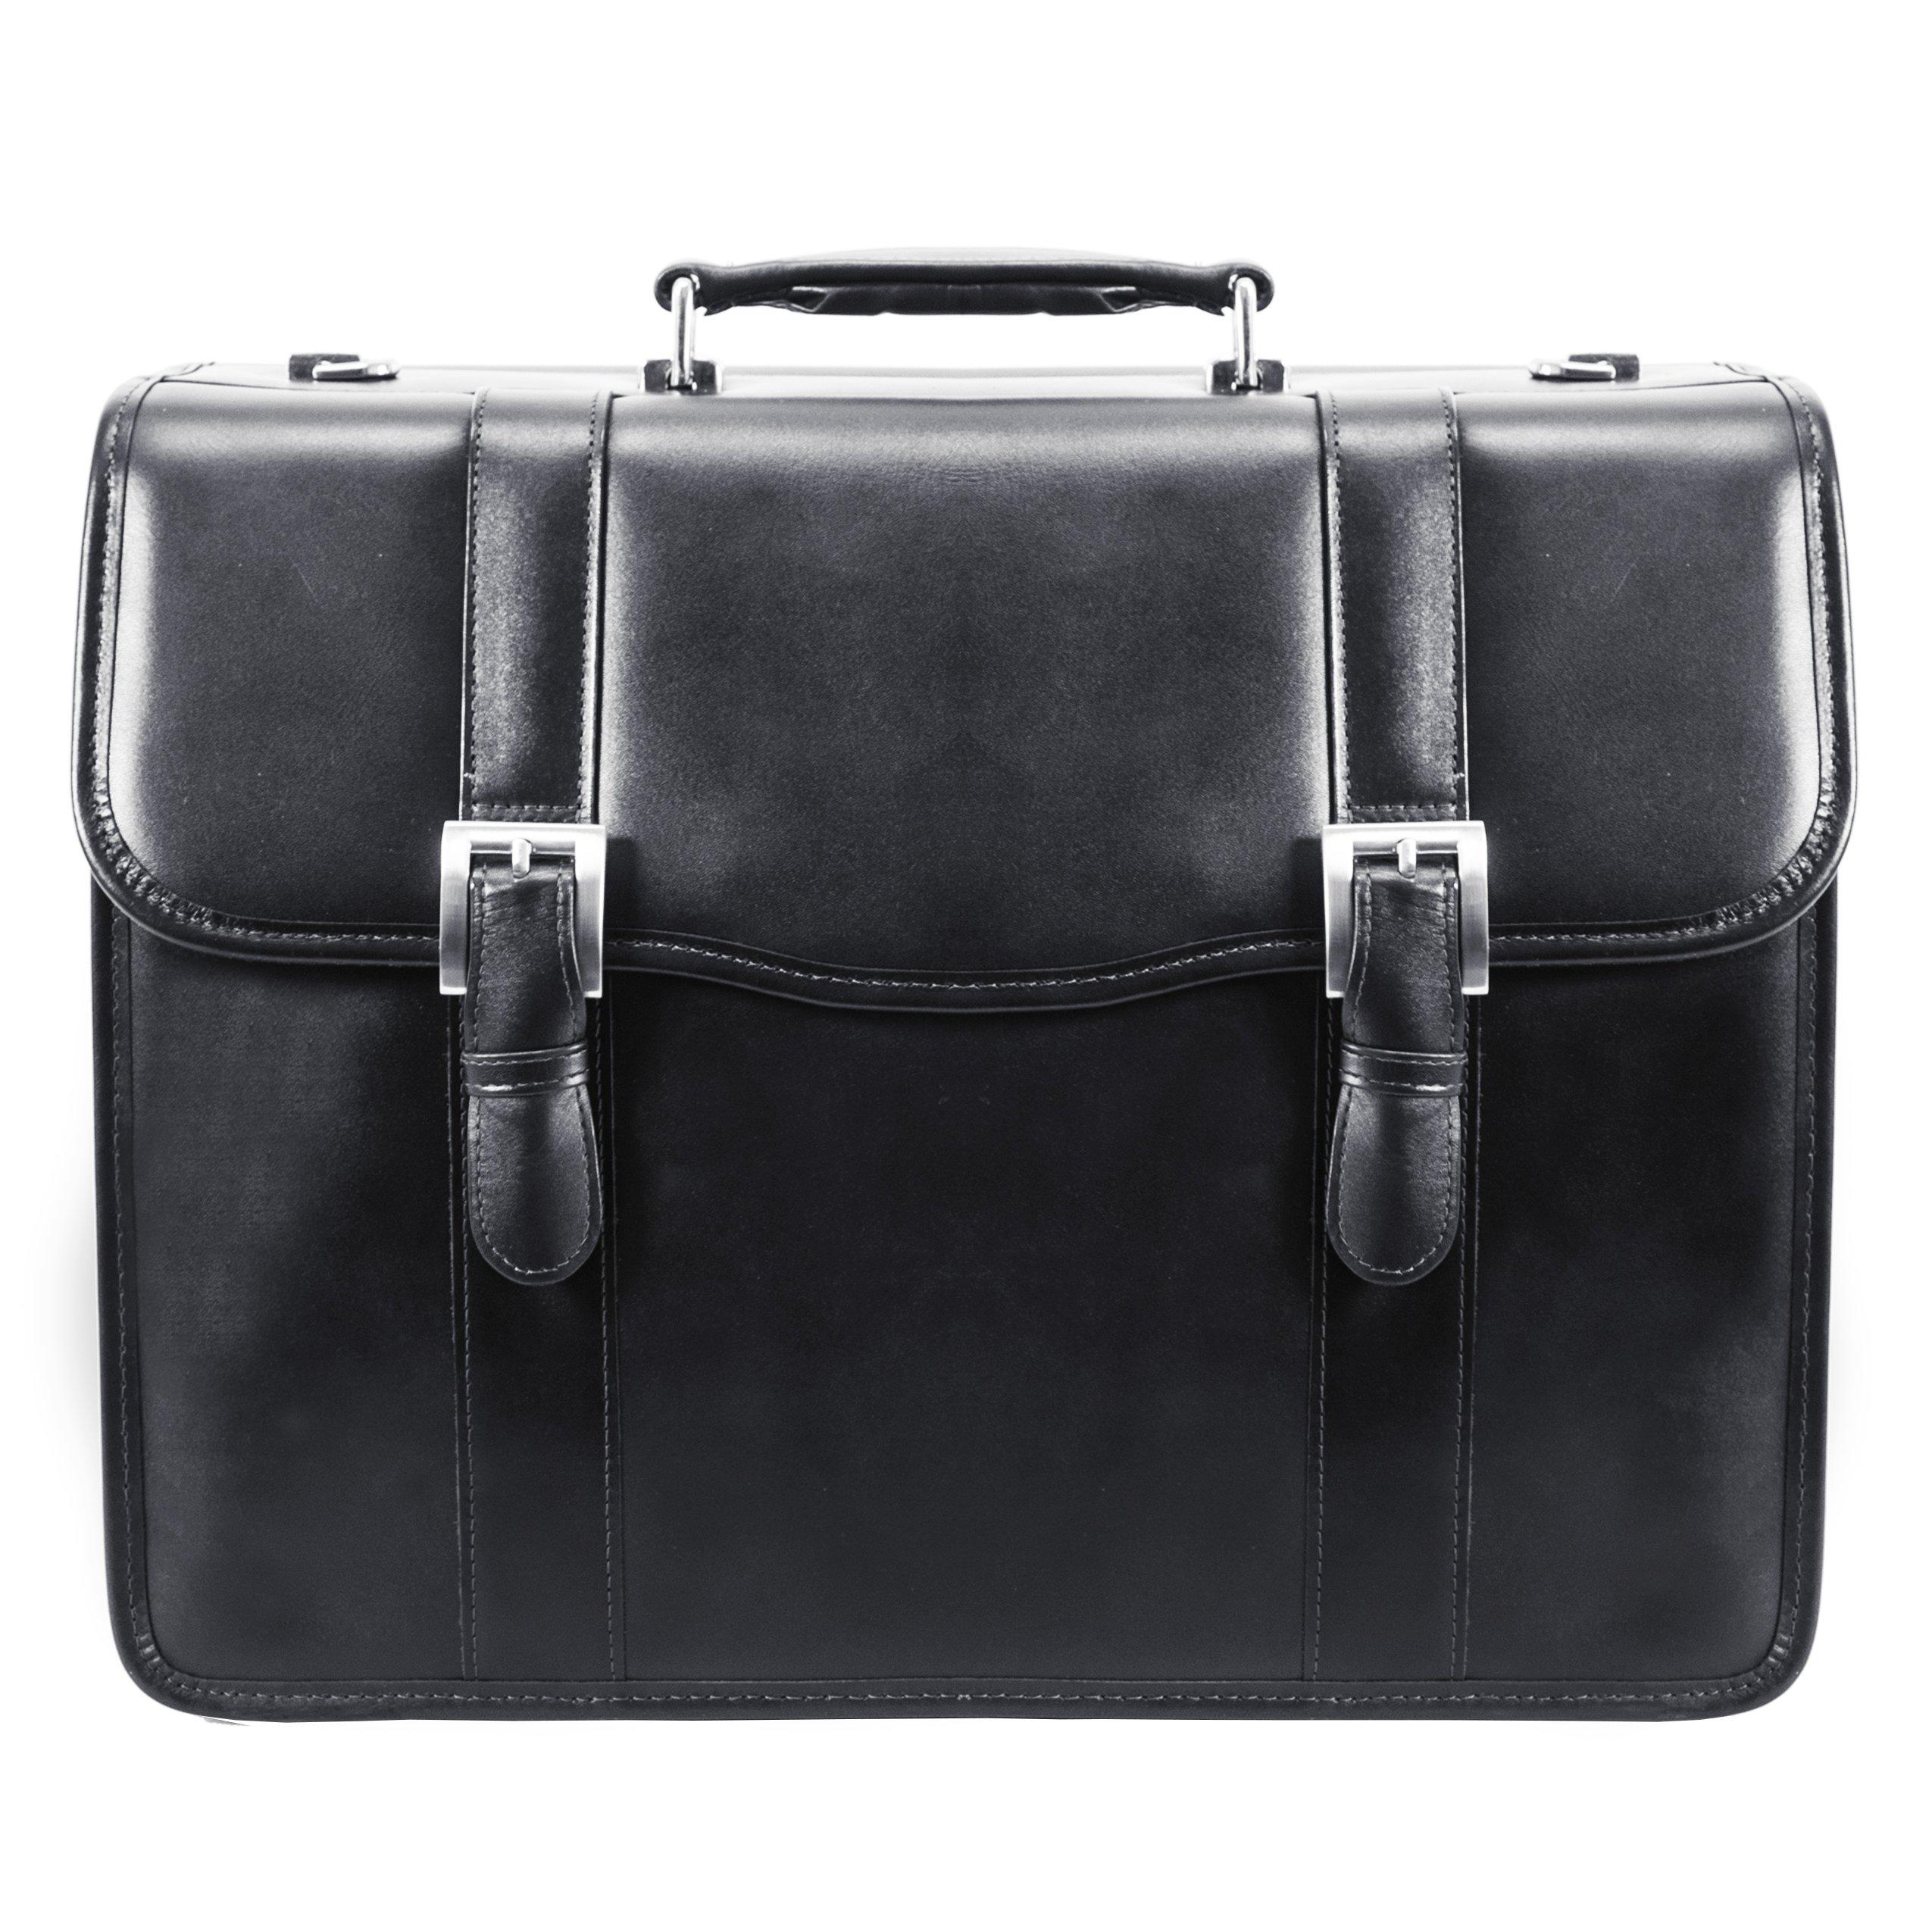 McKlein, V Series, FLOURNOY, Top Grain Cowhide Leather, 15'' Leather Double Compartment Laptop Briefcase, Black (85955) by McKleinUSA (Image #5)